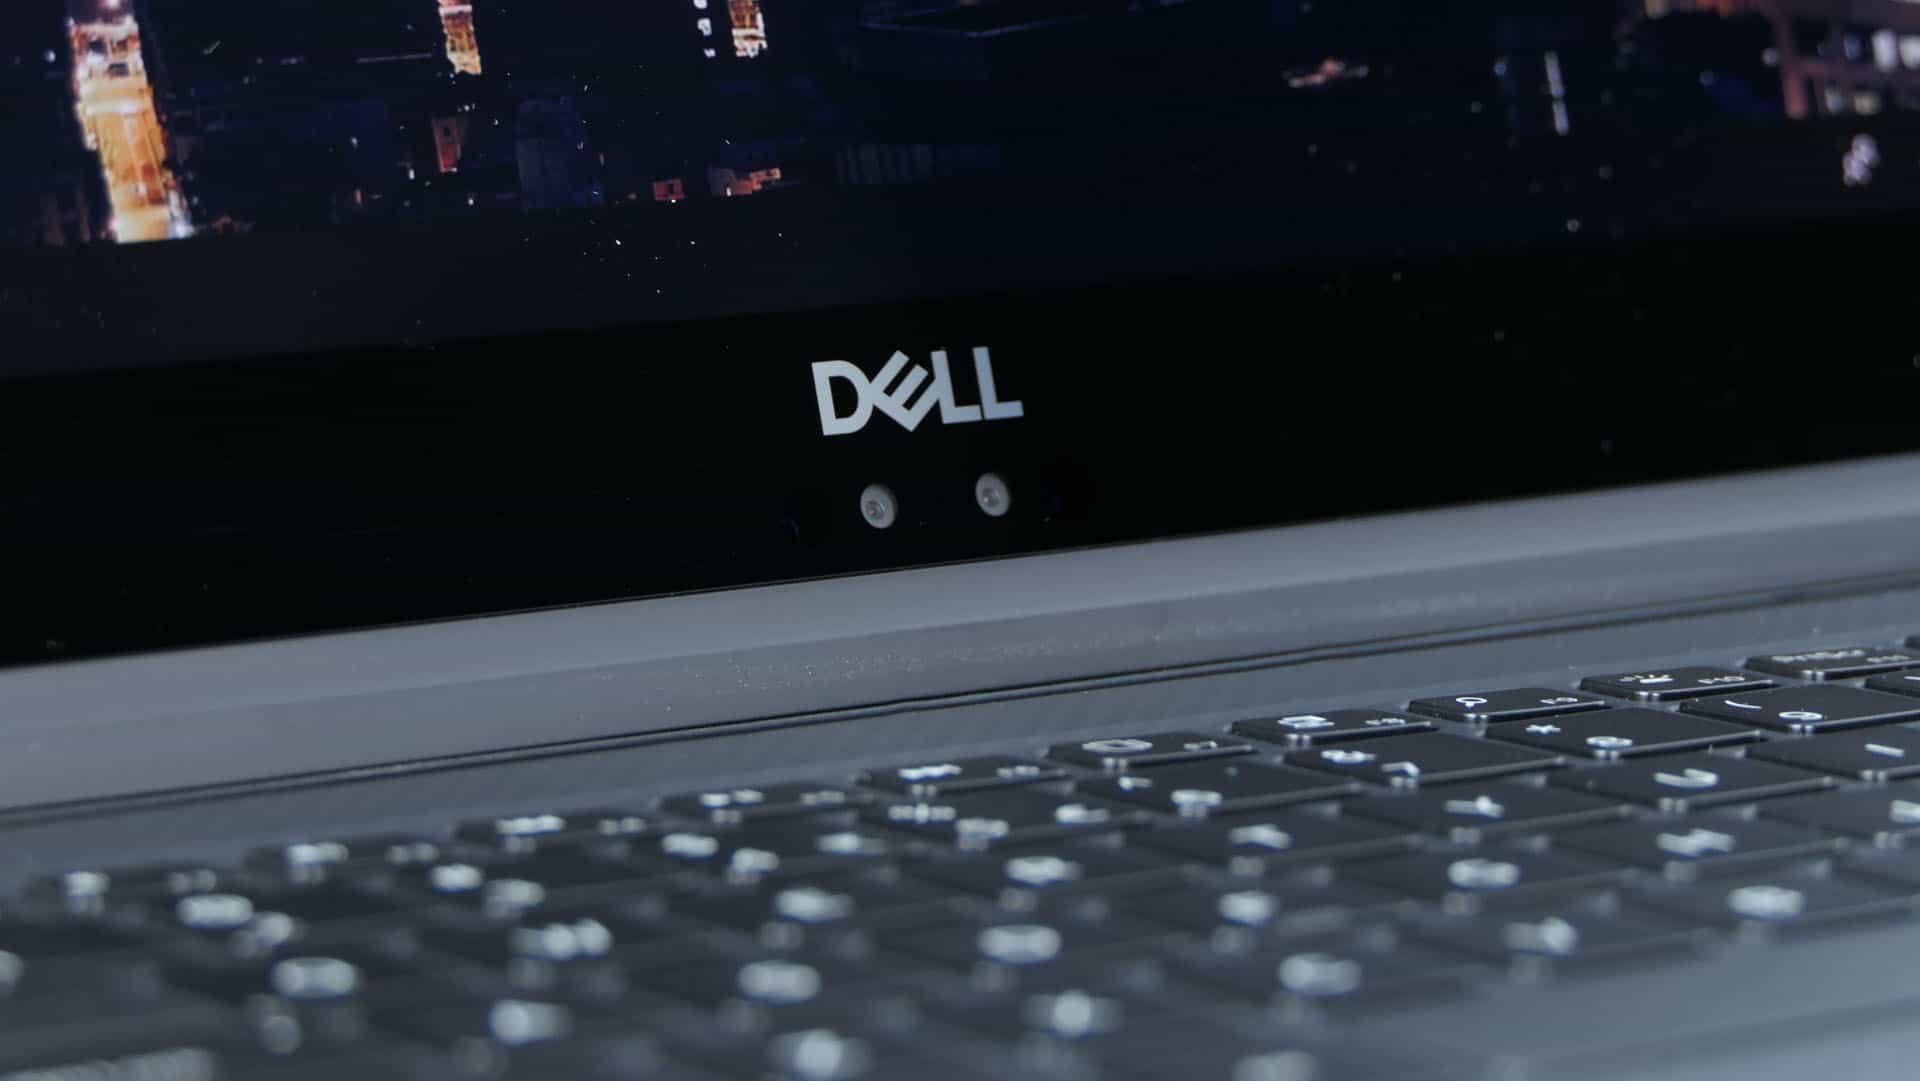 Dell XPS 15 9575 2 w1 - kamerka zewparciem dla Windows Hello